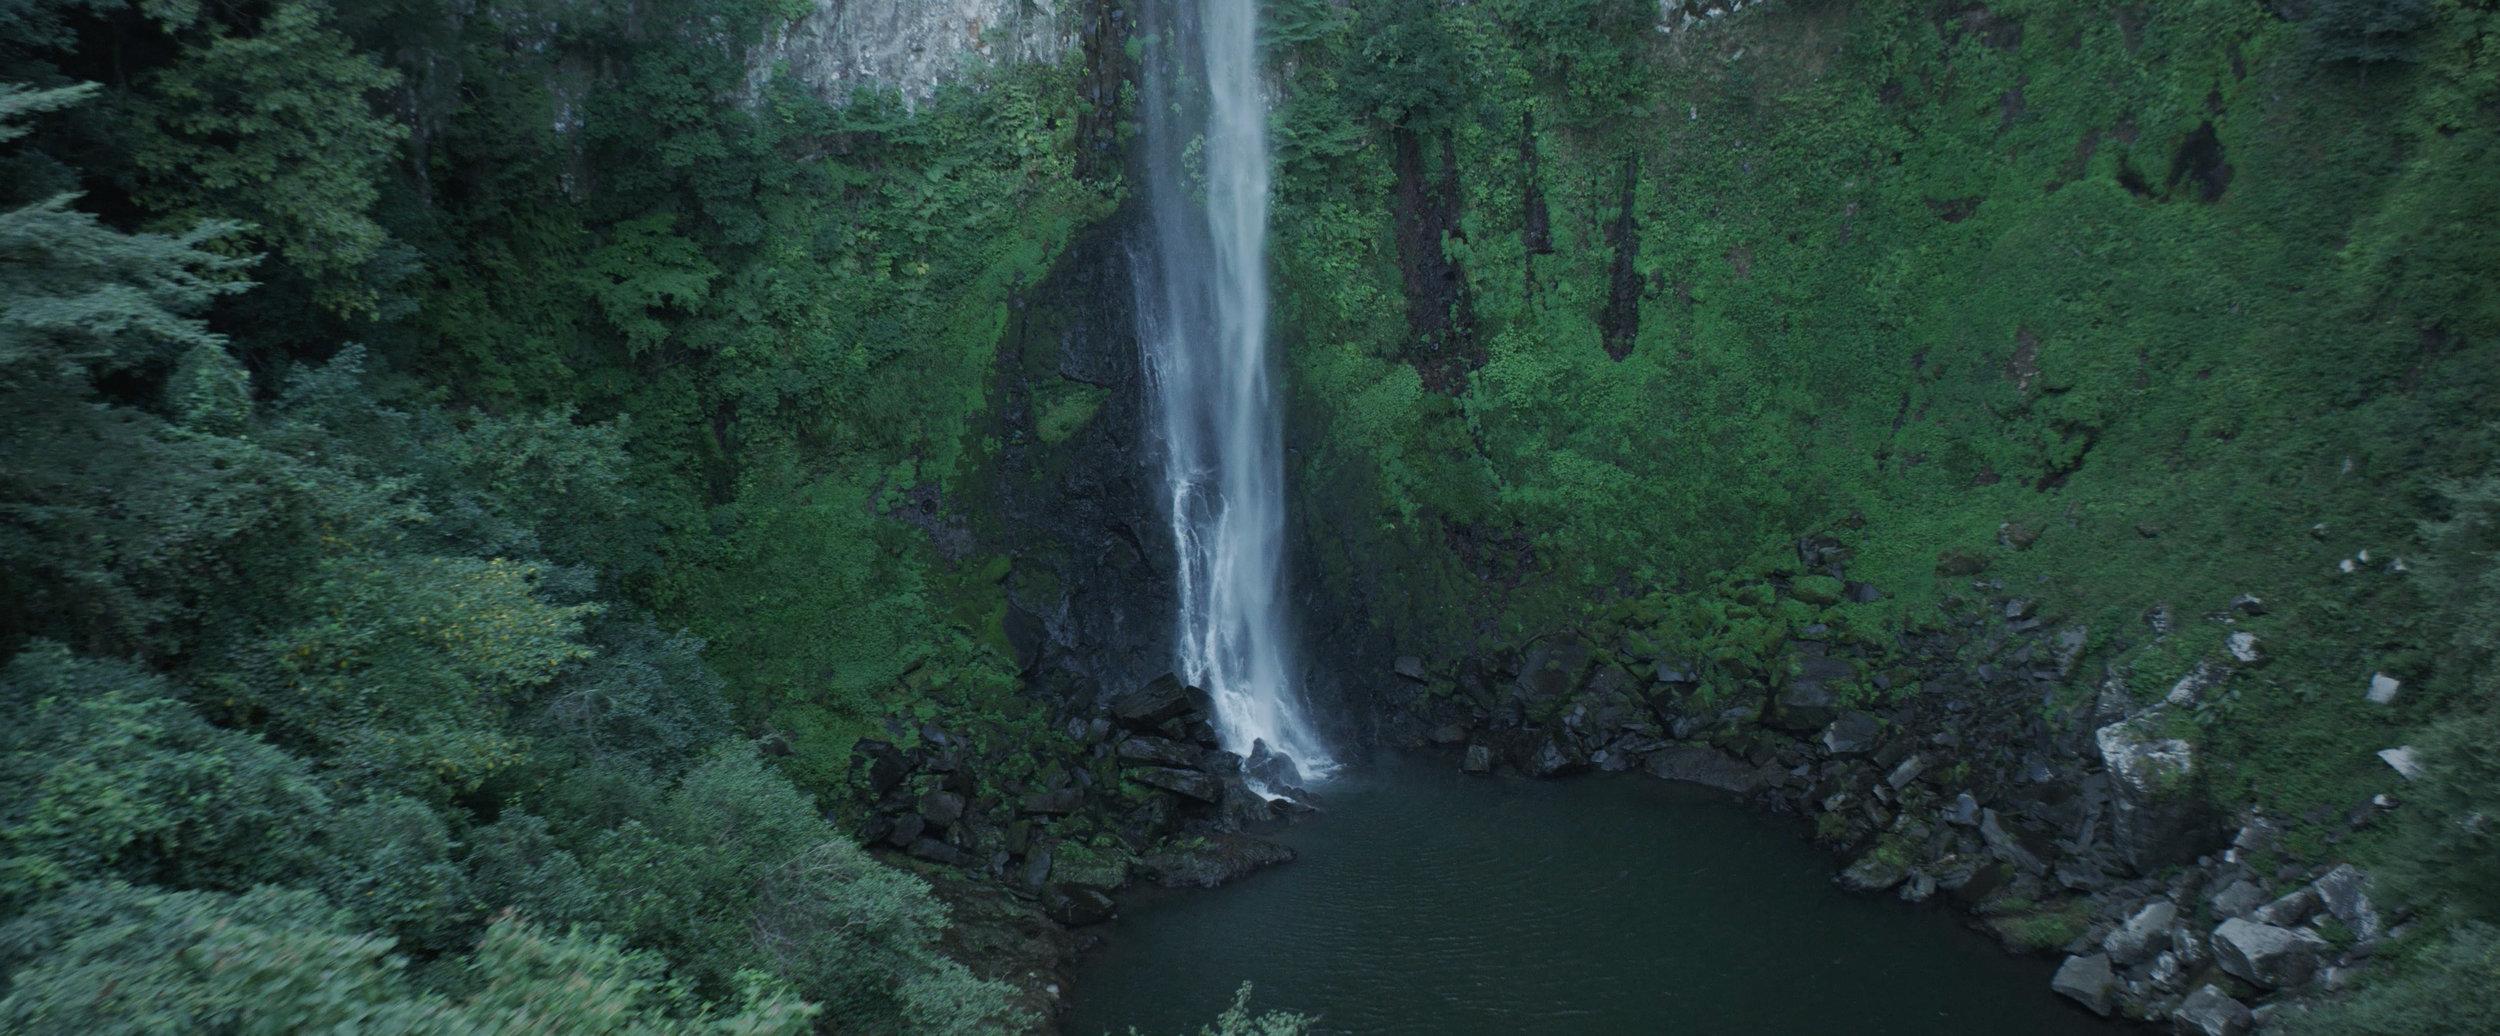 Oliver Millar Lexus_Waterfall_Bowl.jpg